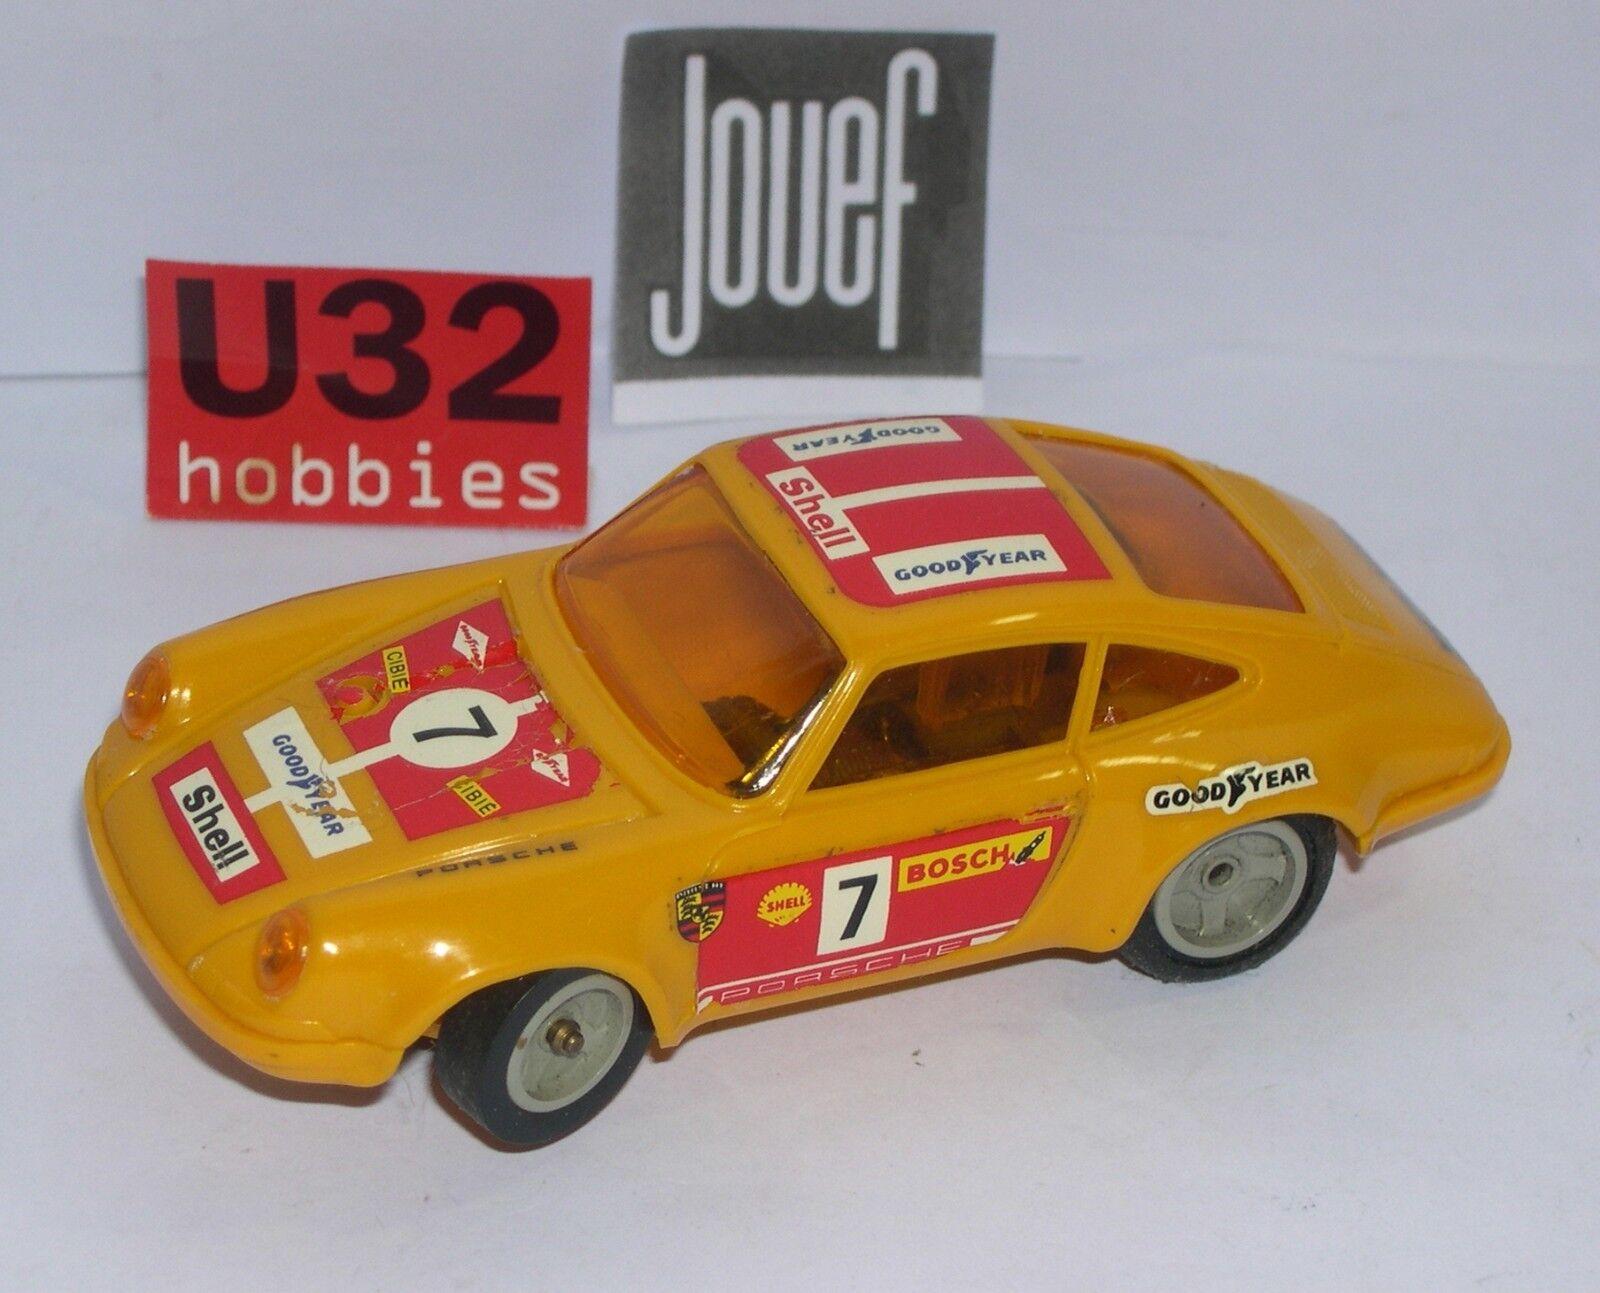 FN JOUEF 3658 SLOT CAR PORSCHE 911 S  7 arancia VERY GOOD CONDIZIONE UNBOXED